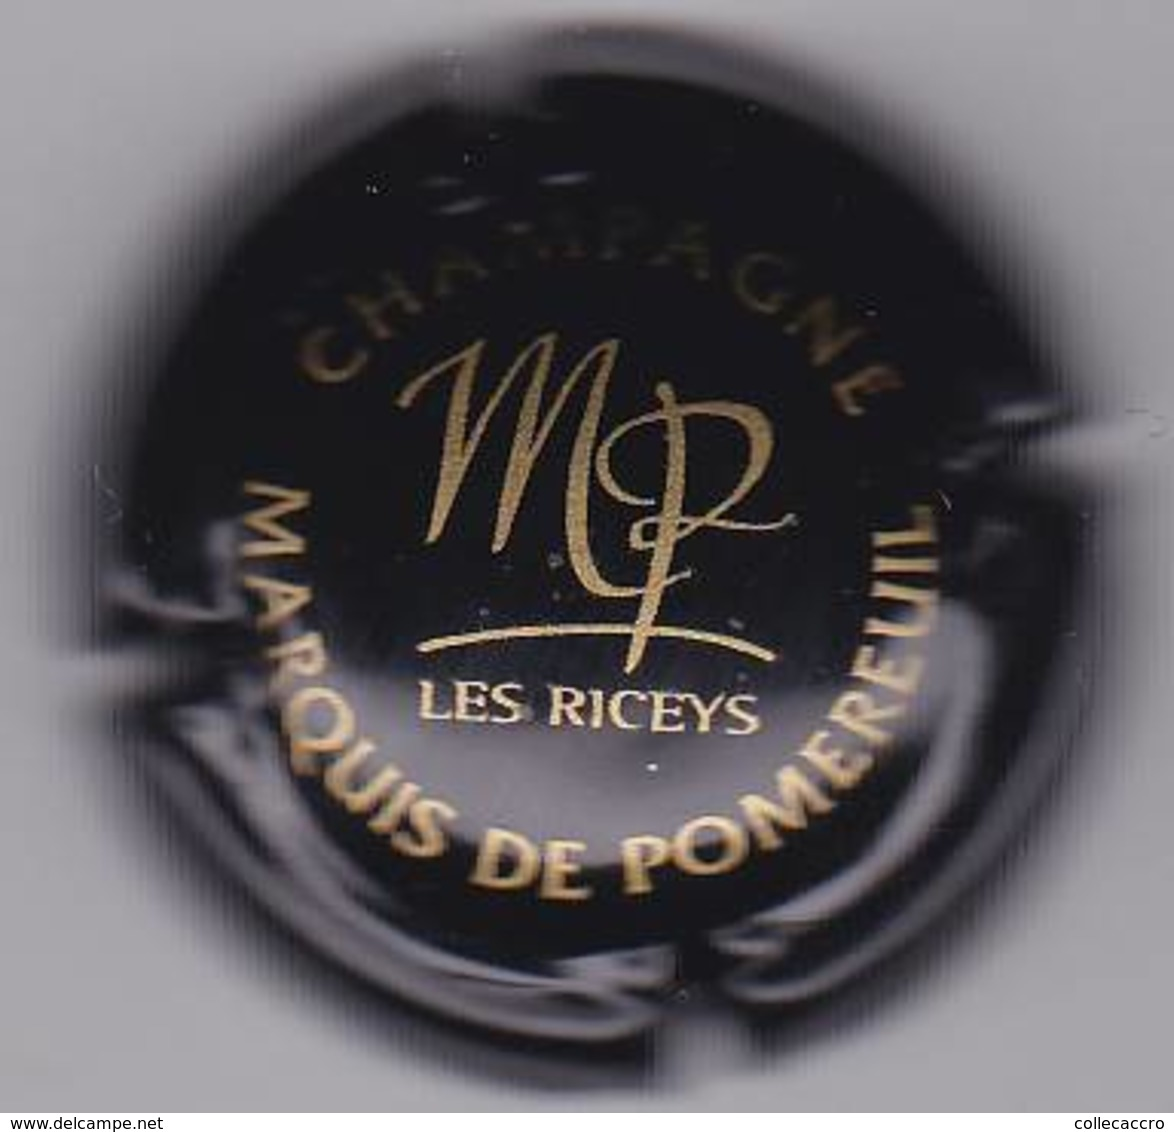 MARQUIS DE POMEREUIL N°12 - Champagne